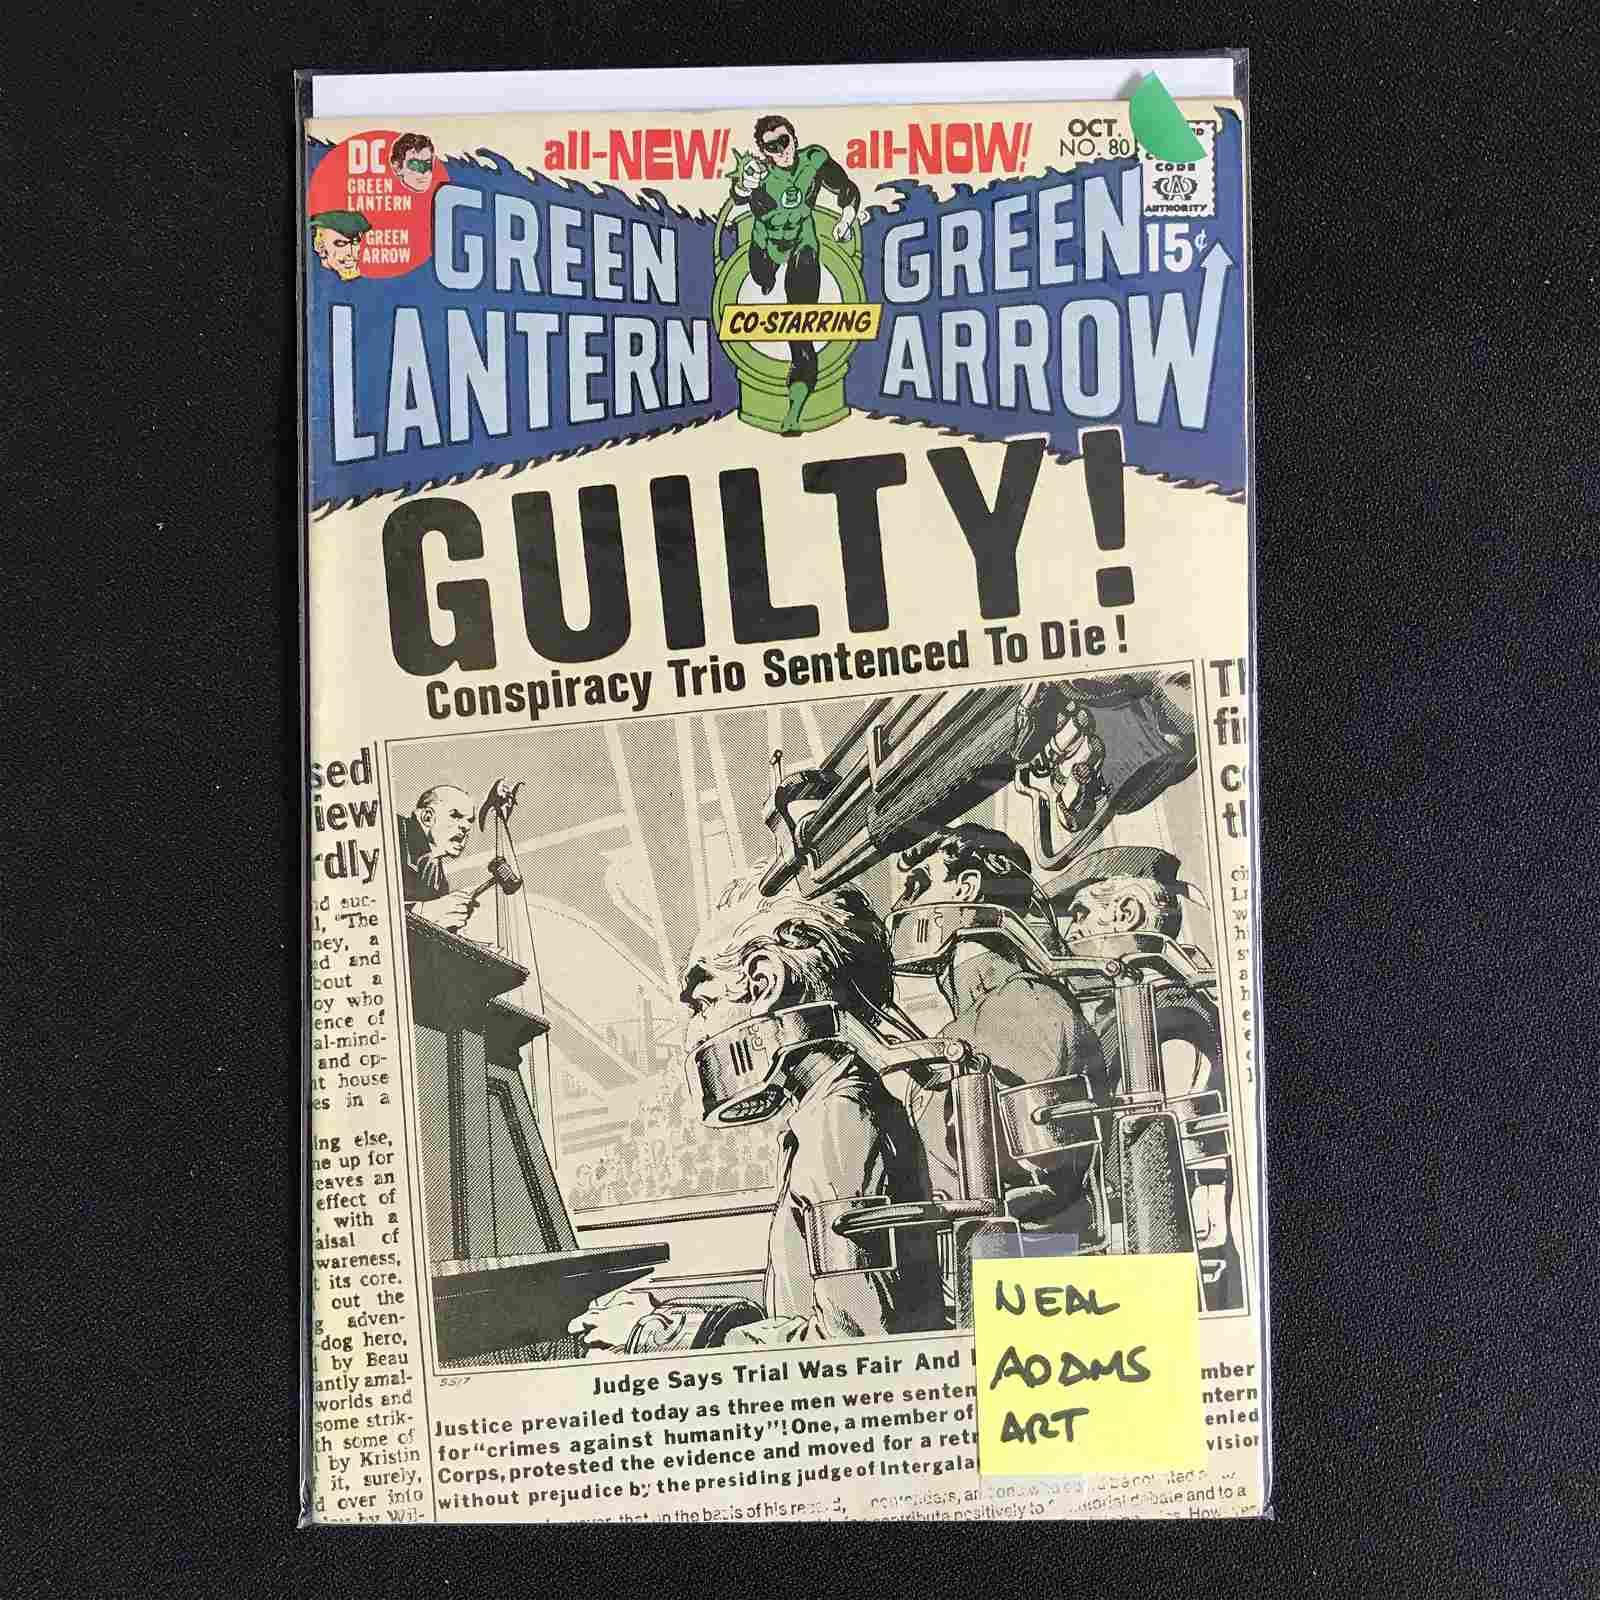 GREEN LANTERN Co-Starring GREEN ARROW #80 (DC COMICS)